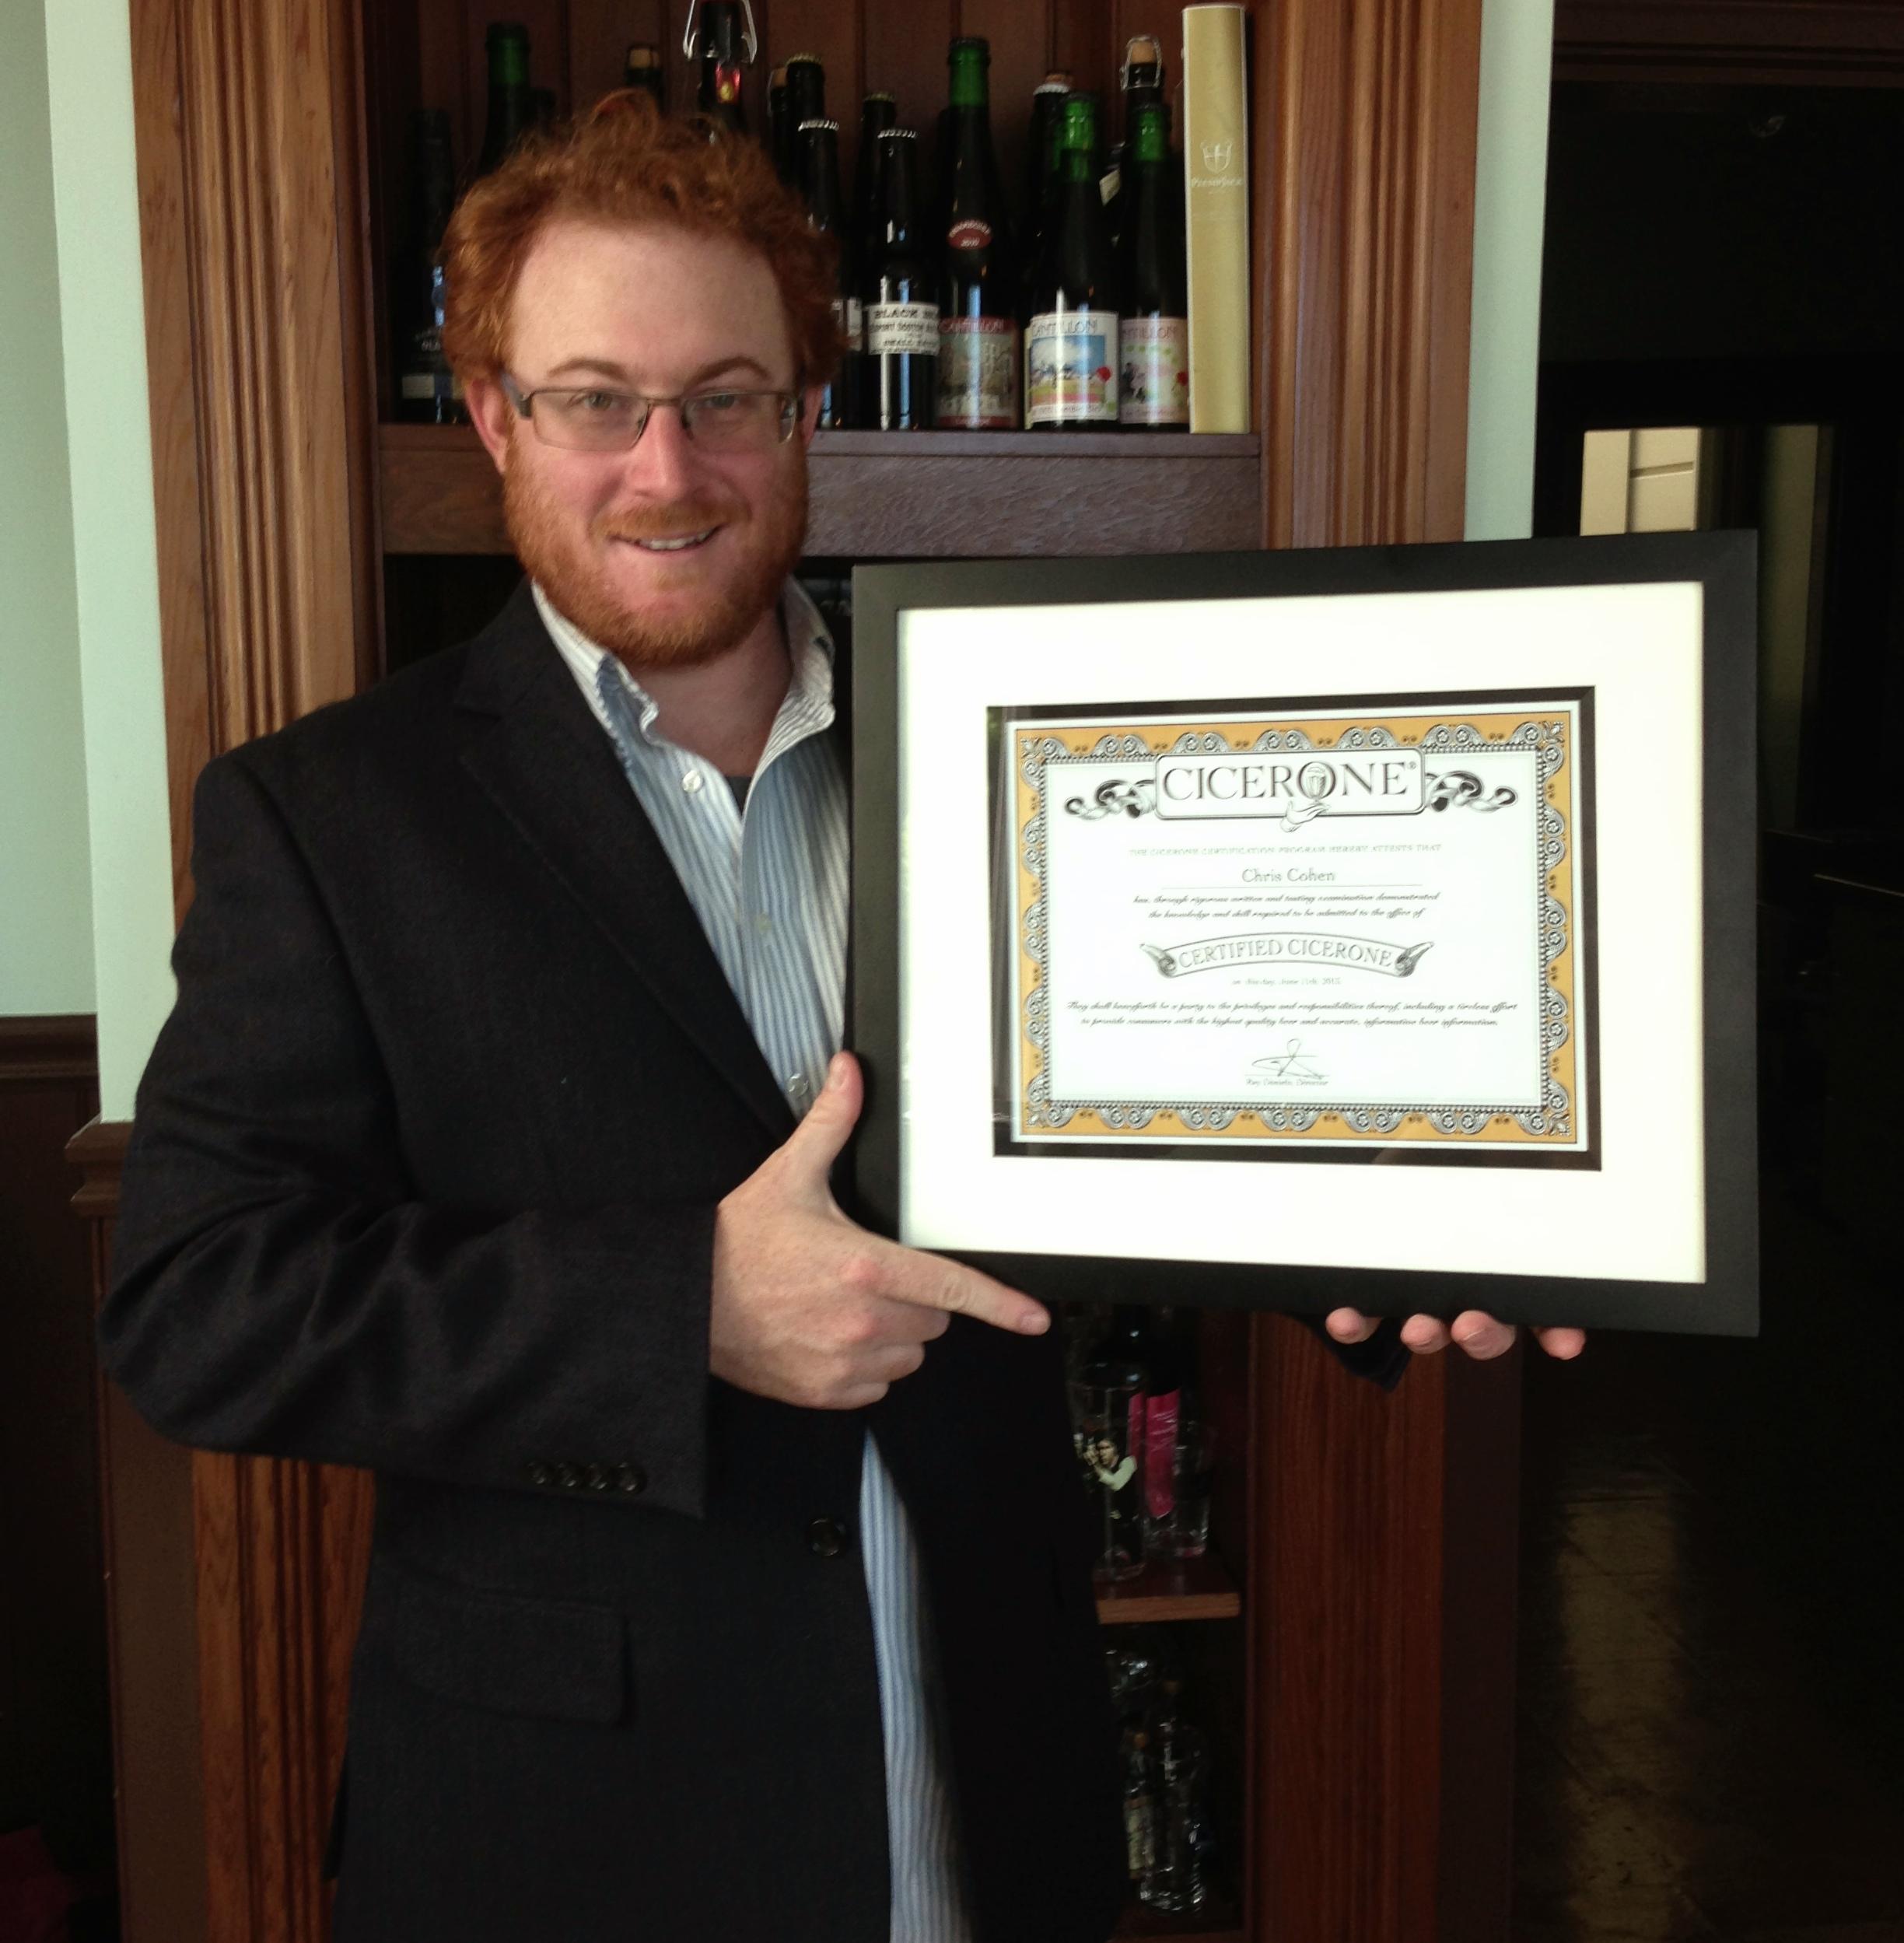 Certified-Cicerone-certificate-Chris-Cohen.jpg